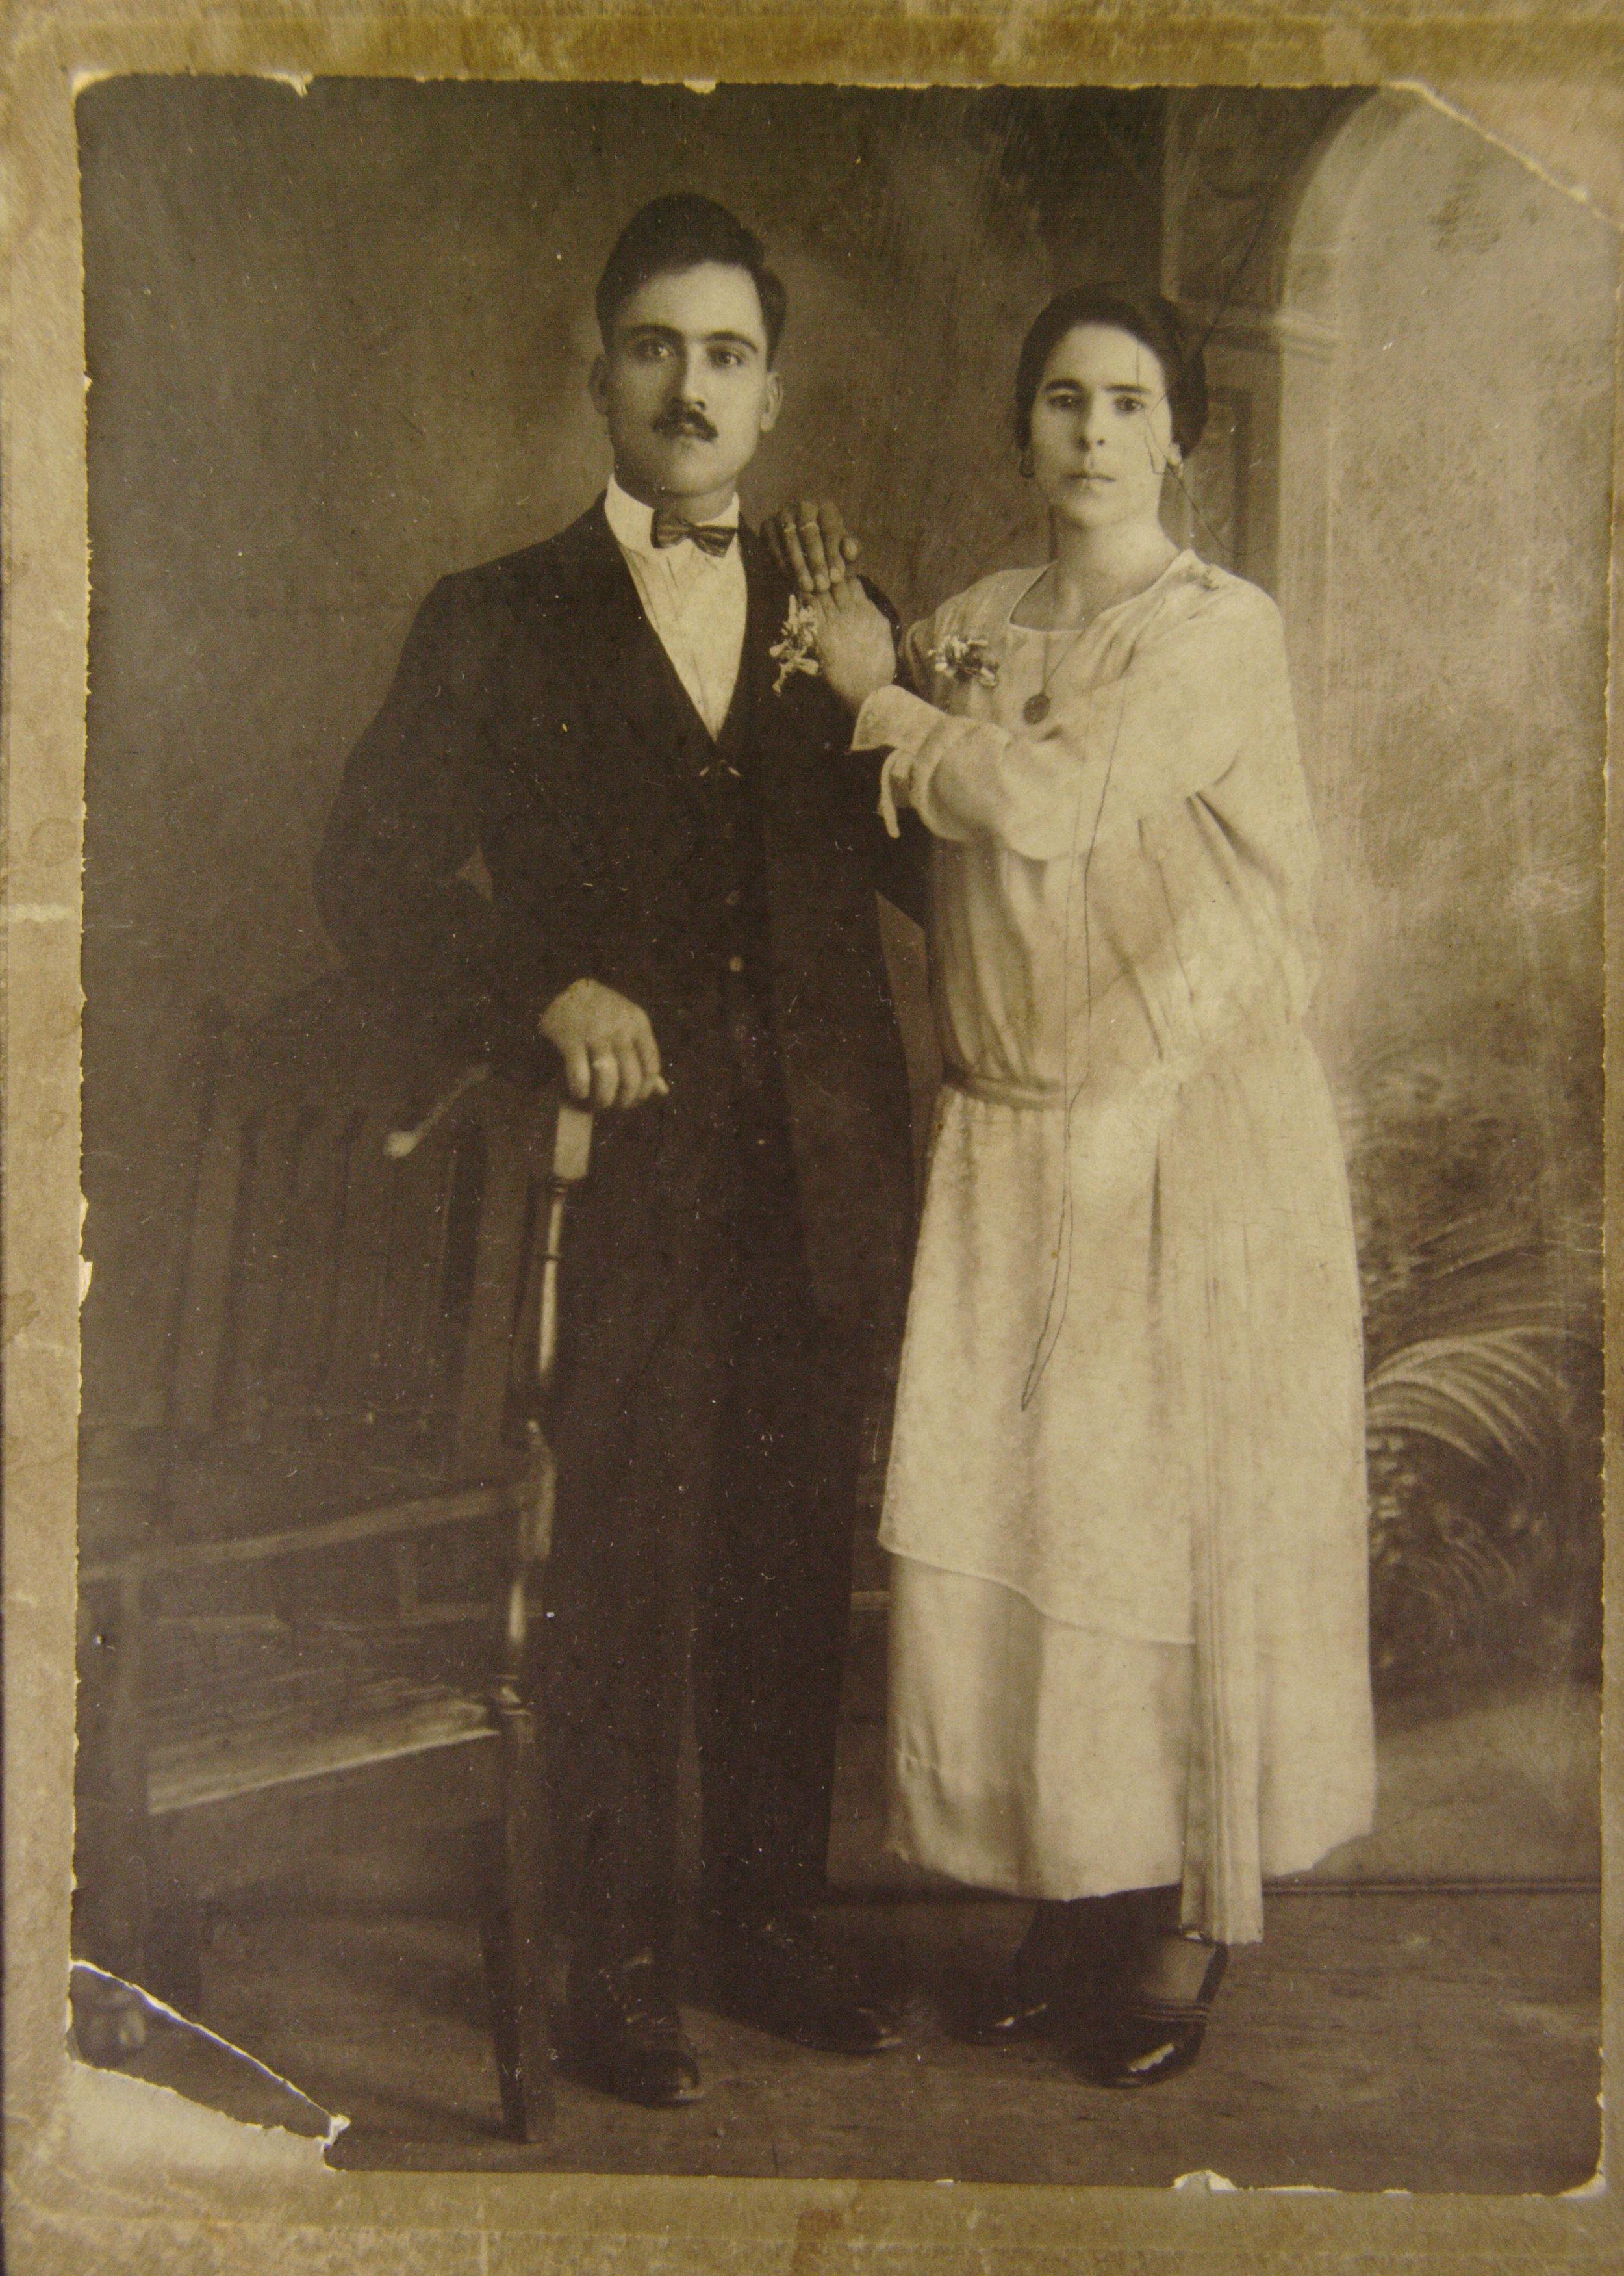 Demetrios (James) and Photini Halvis Wedding